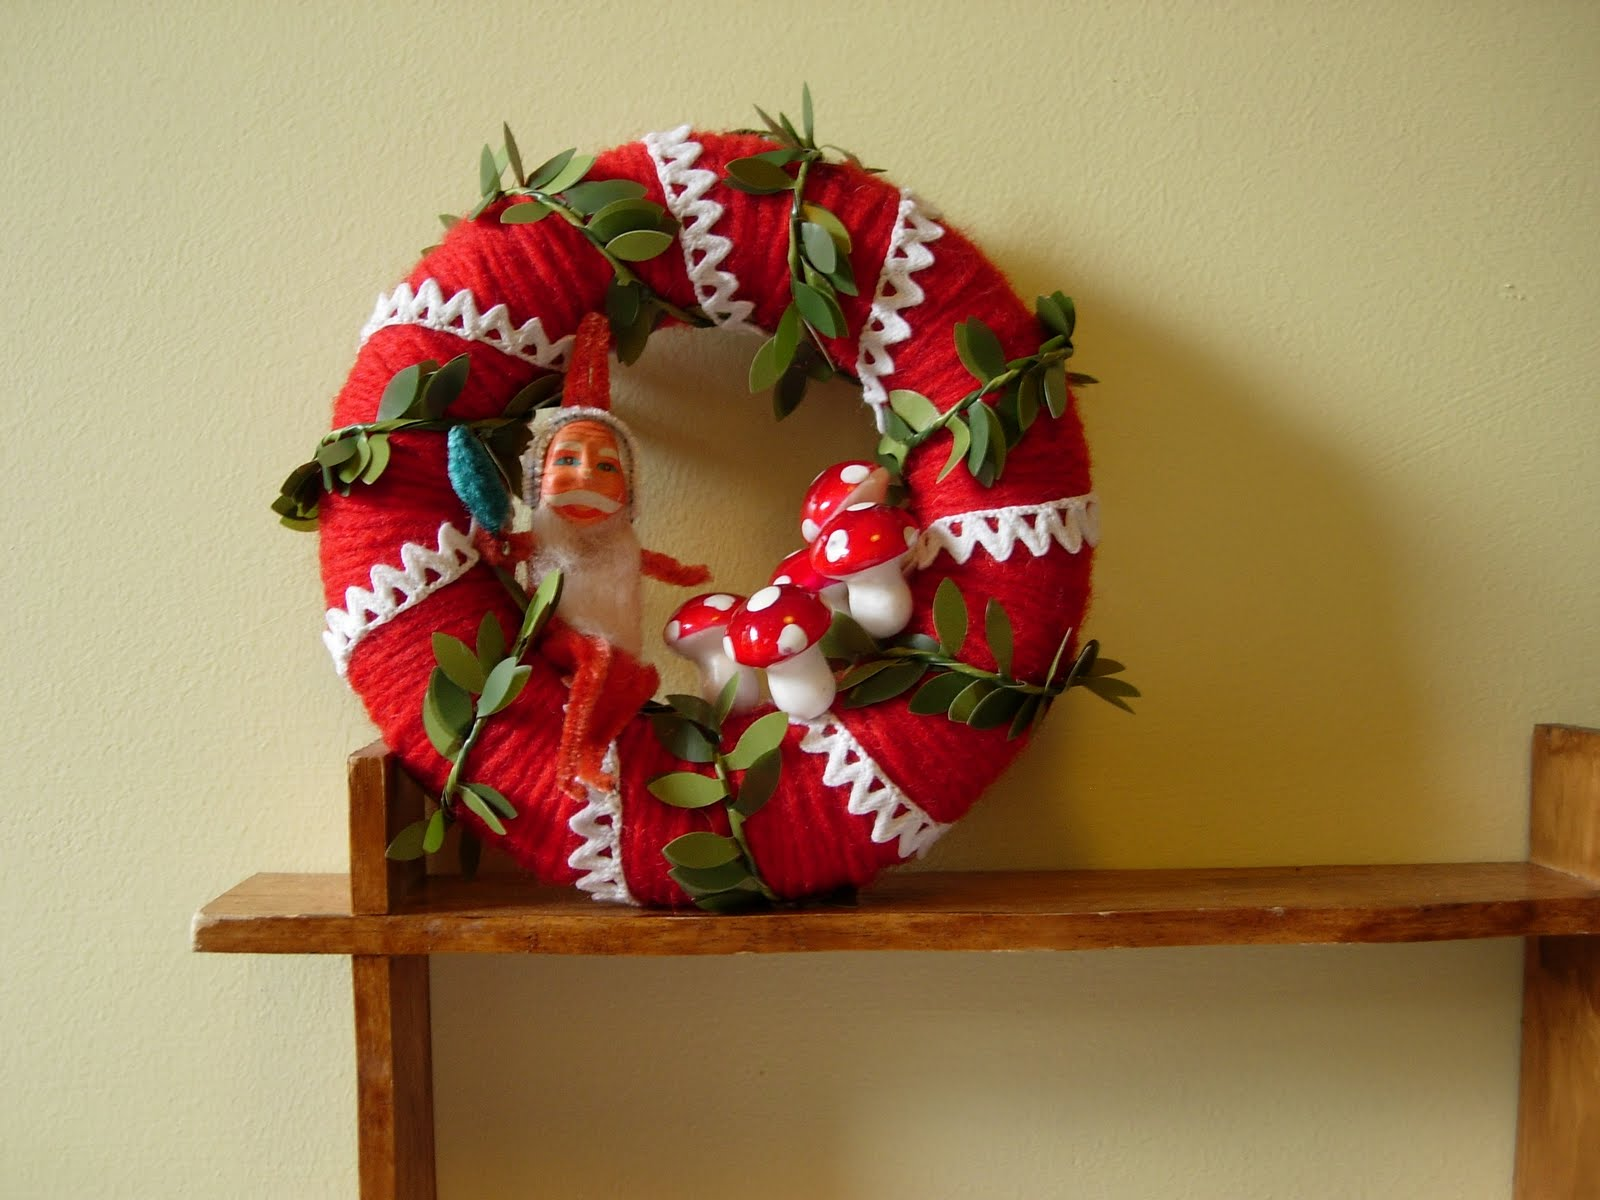 maximum RABBIT designs: A Kitschy Christmas